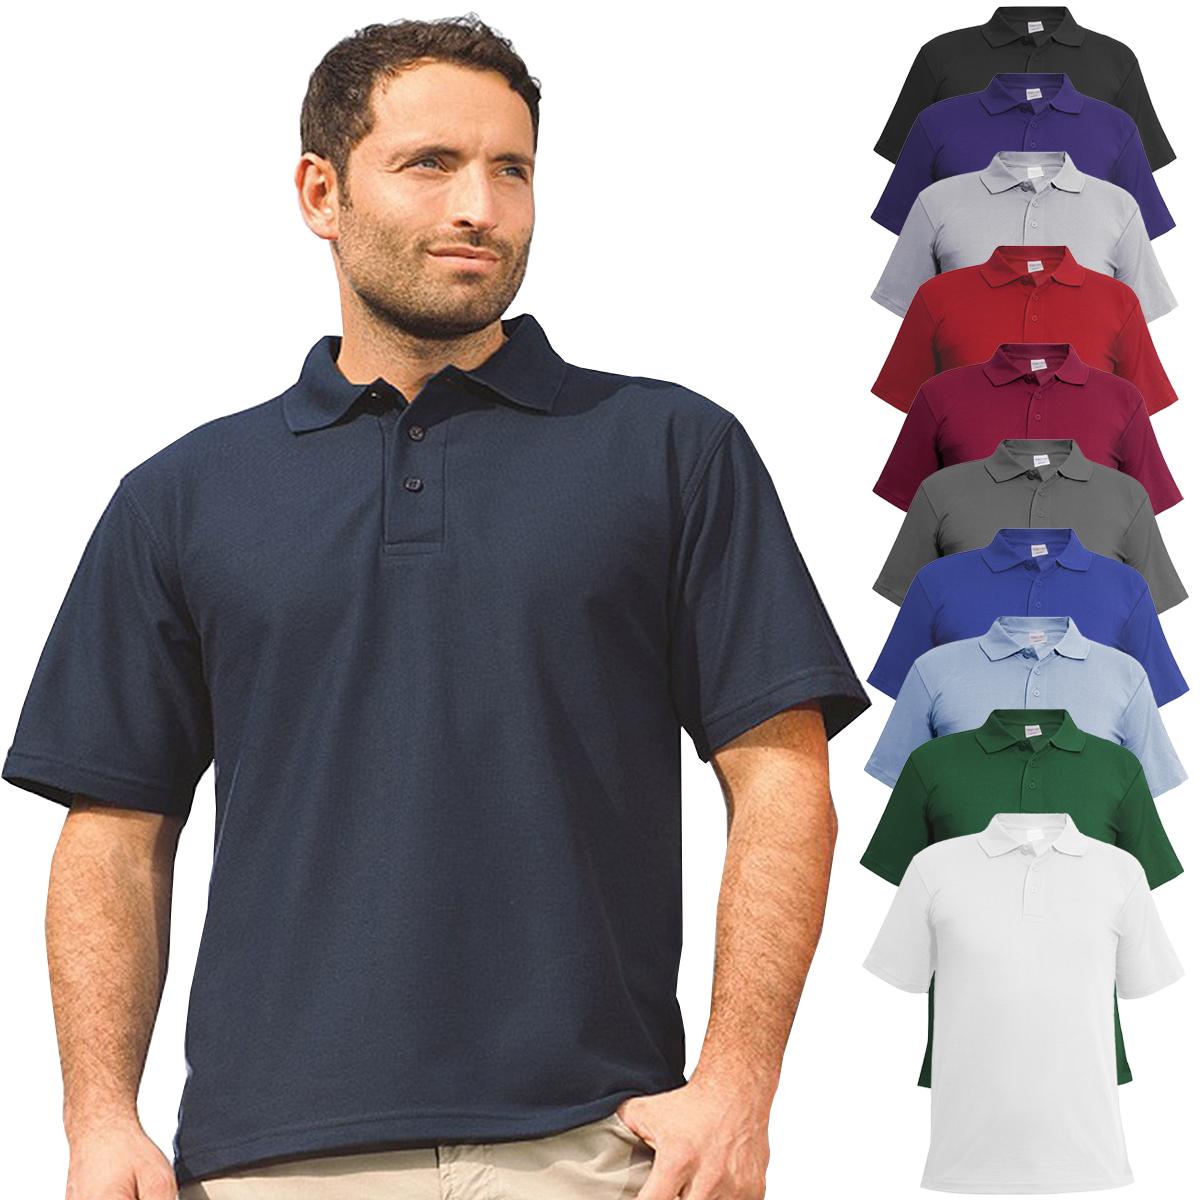 b873f74abc2486 Mens Classic Polo Top Plus Size T-Shirt Plain Shirt Big And Tall Short  Sleeve